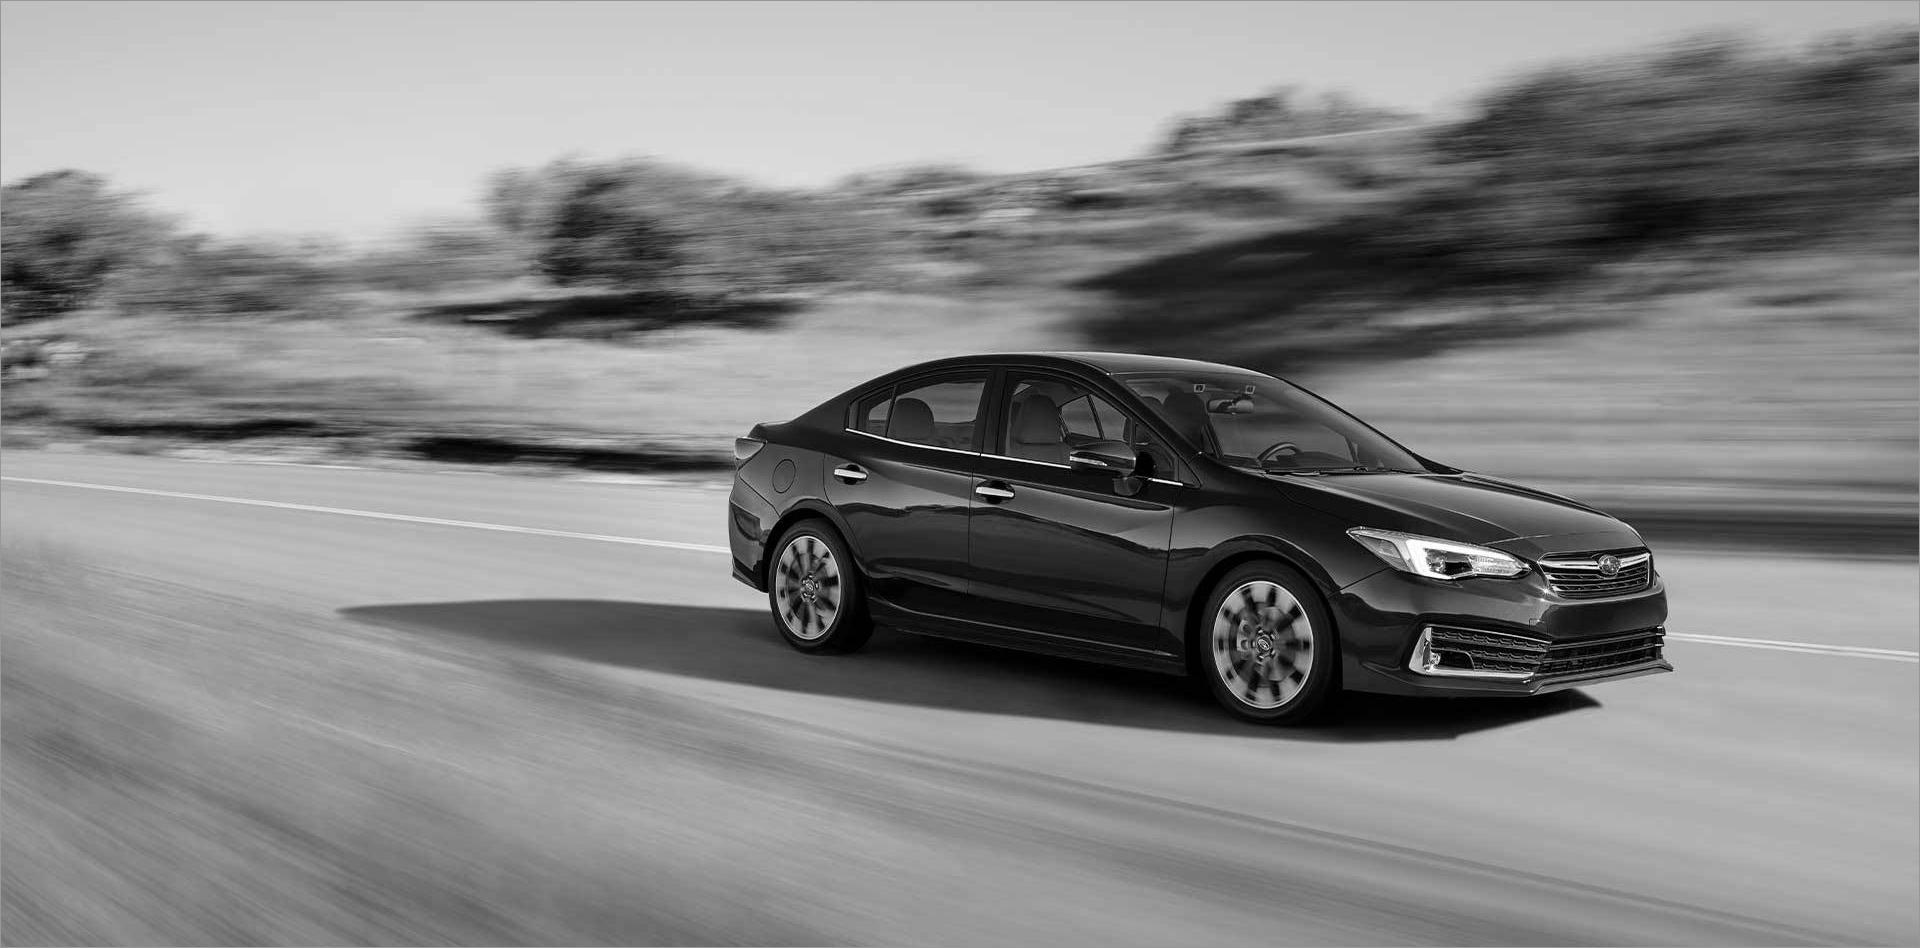 Grayscale Subaru Impreza drives on two lane country road